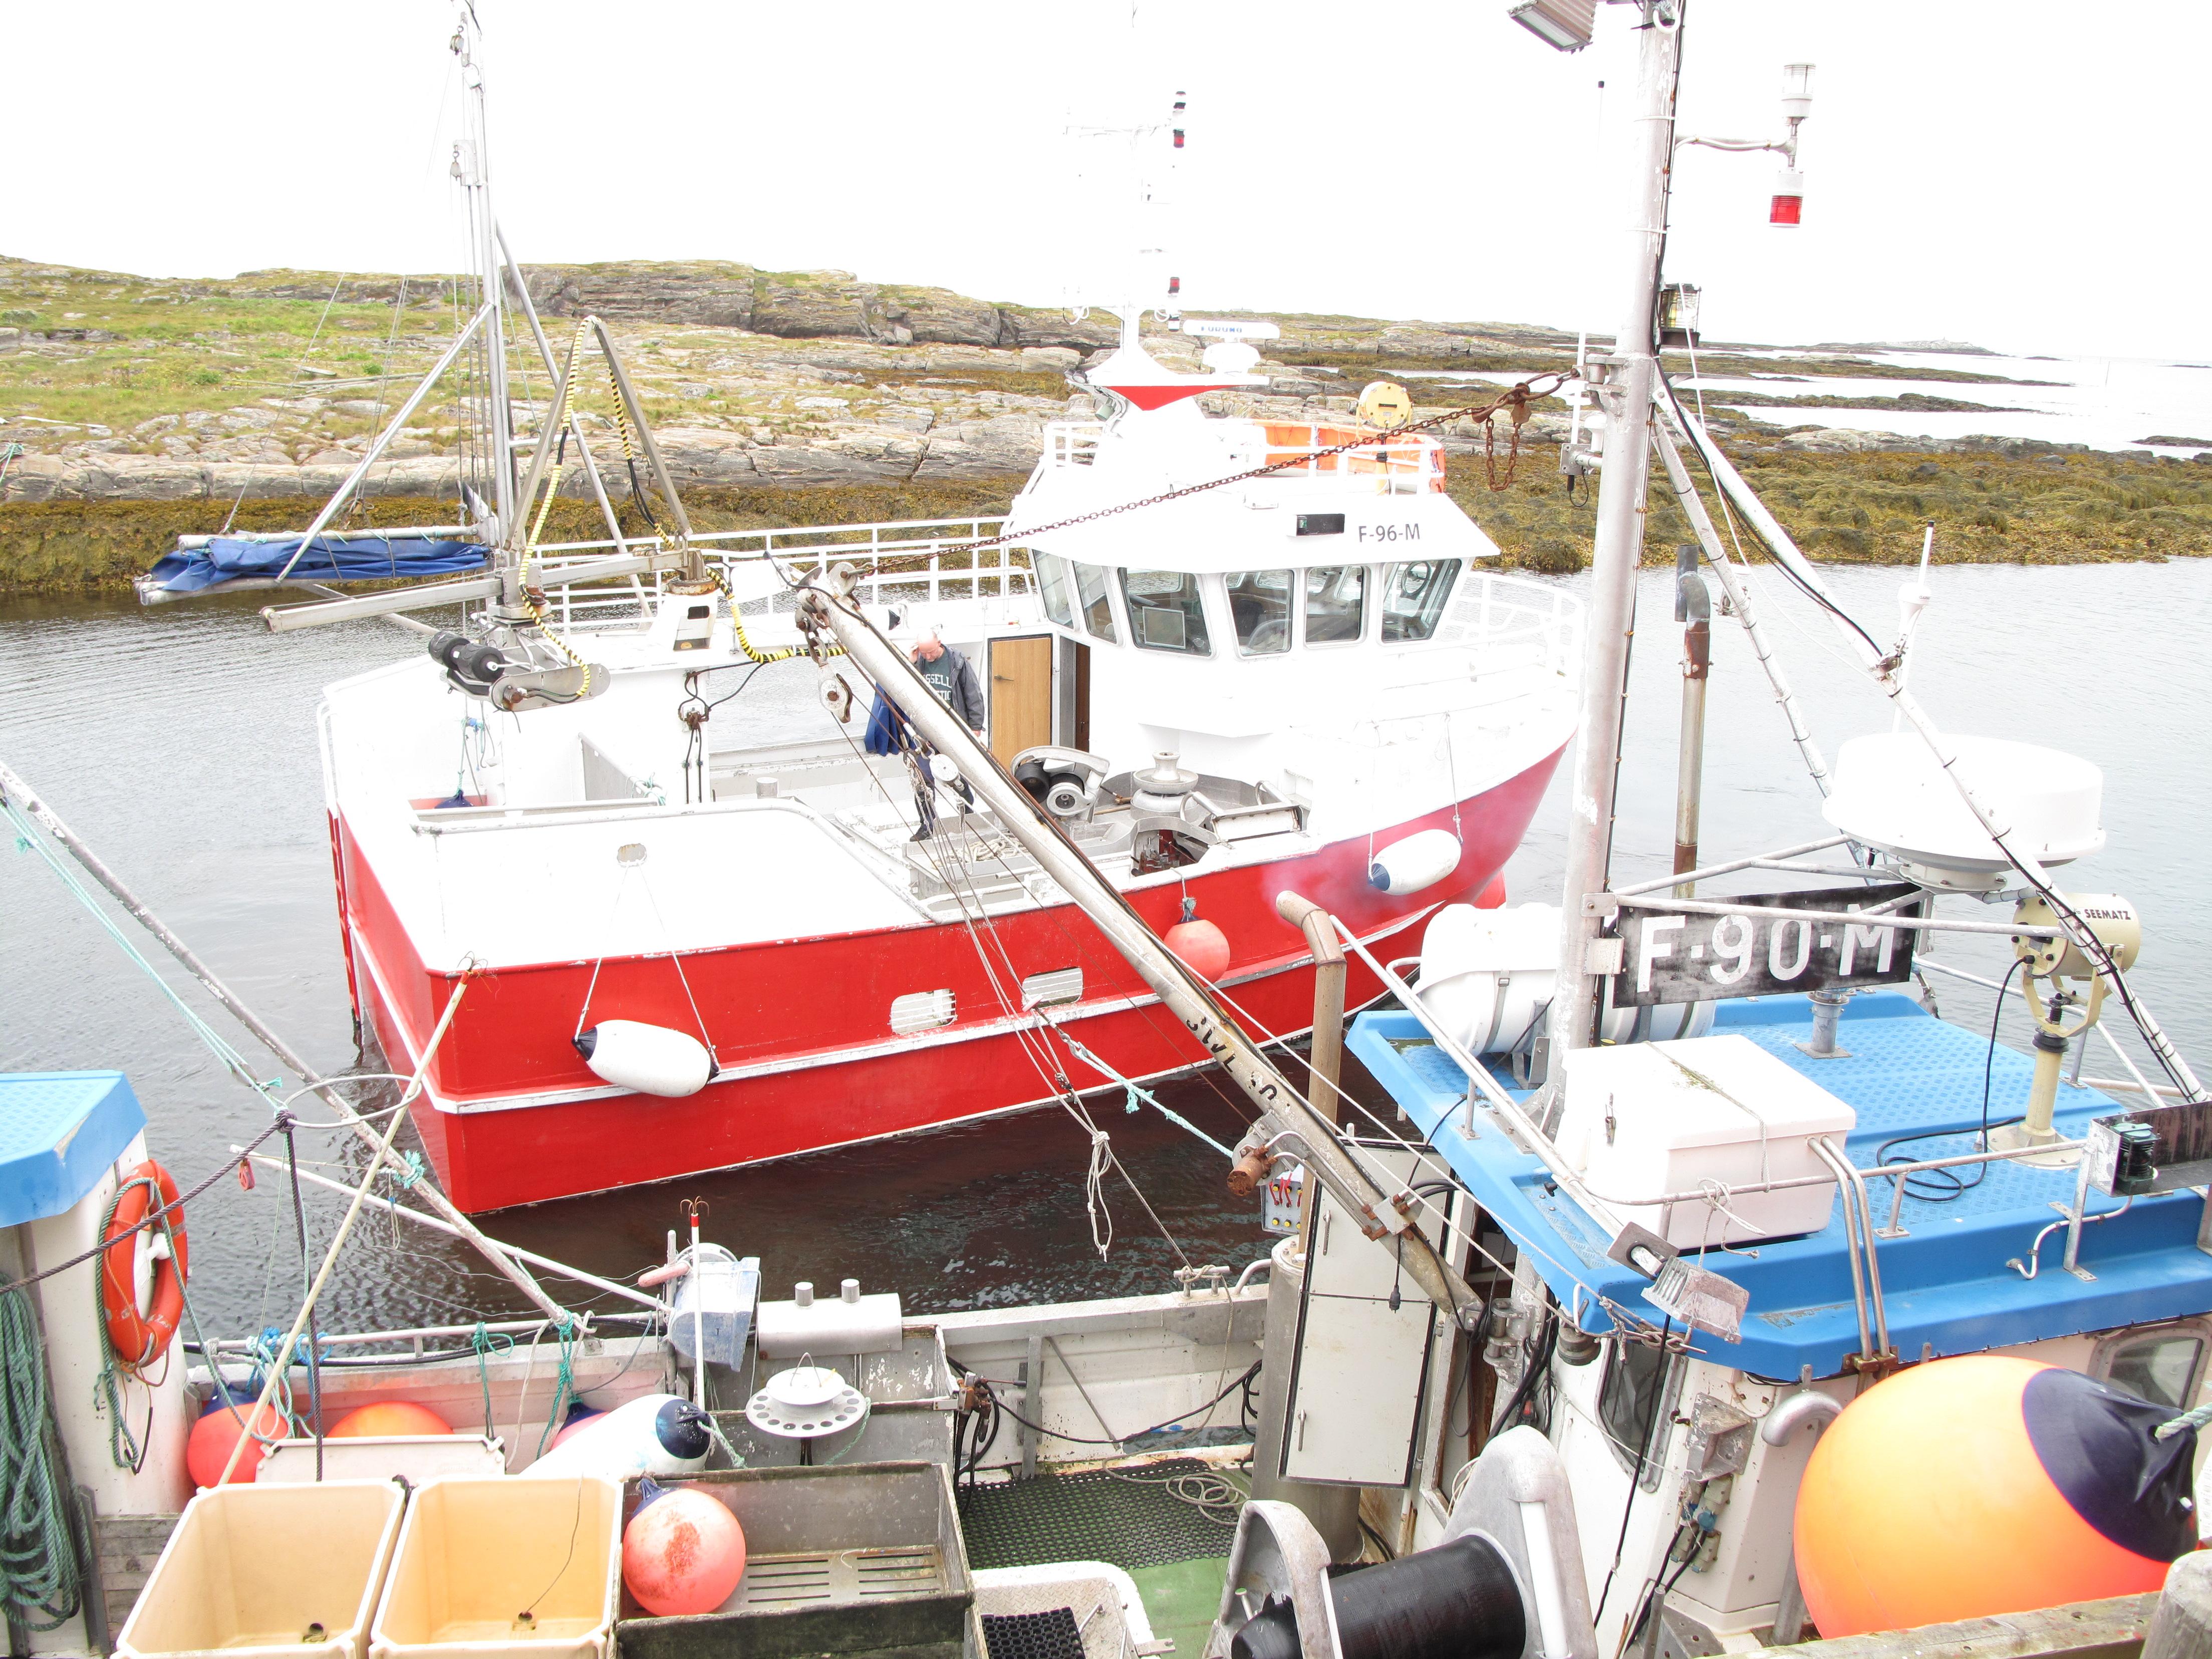 (far) Erlend's boat, (near) Thorleif's boat